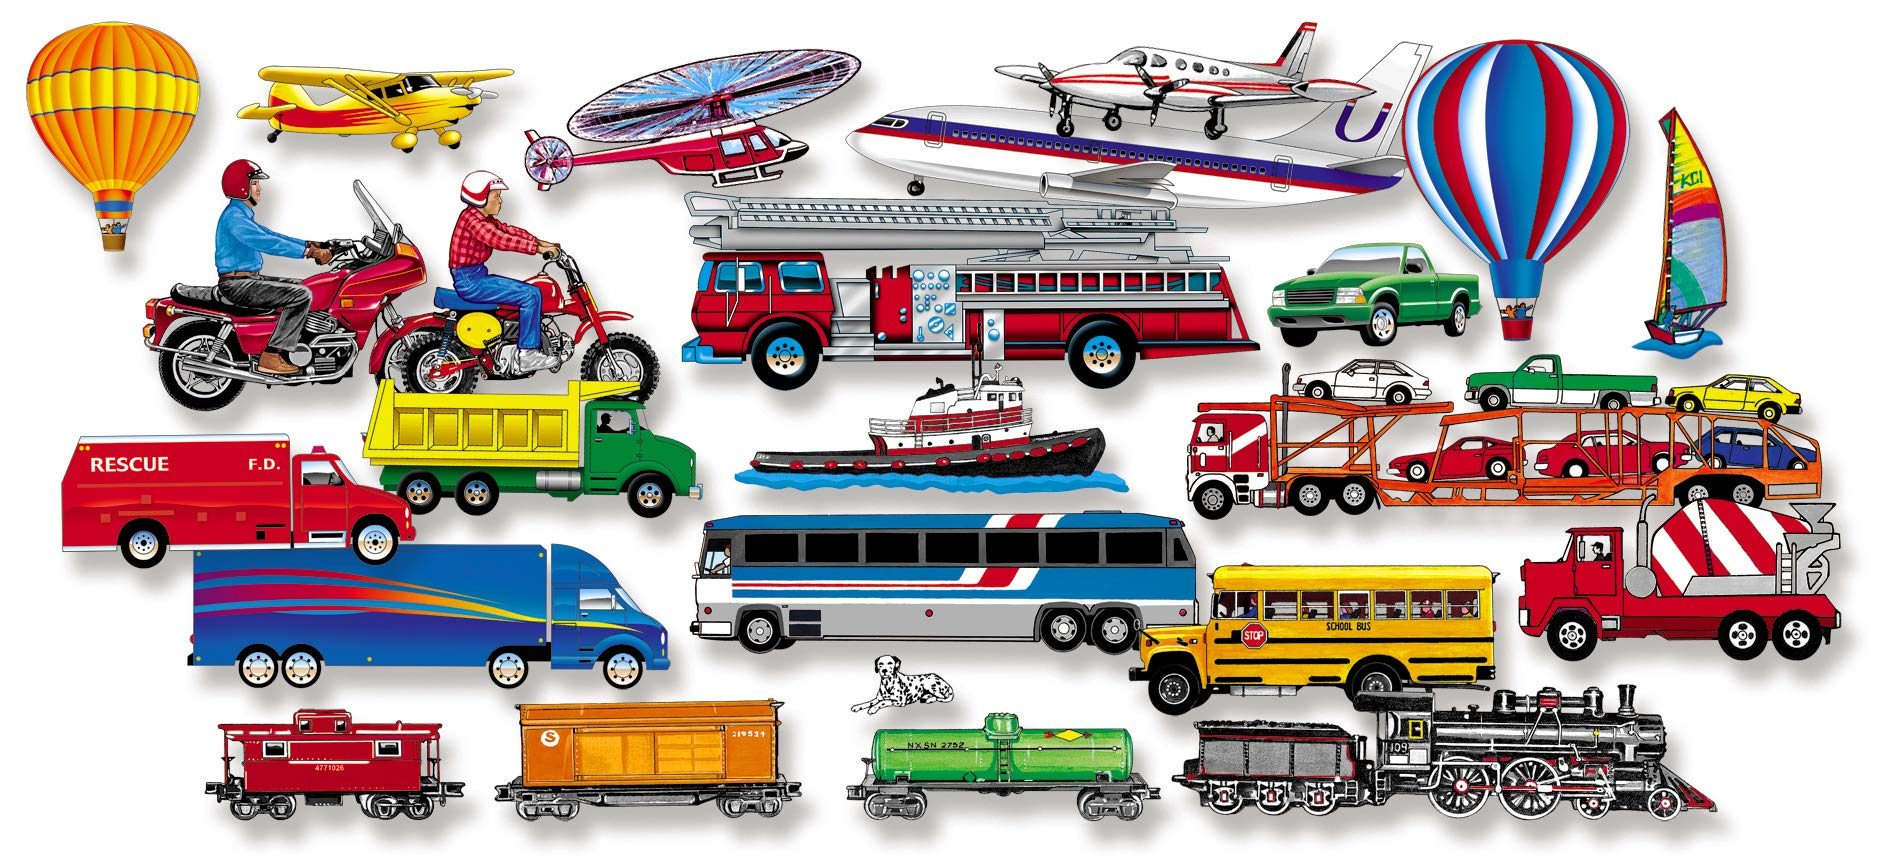 Little Folk Visuals Train, Trucks & Planes Precut Flannel/Felt Board Figures, 24 Pieces Add-On Set   by Little Folk Visual